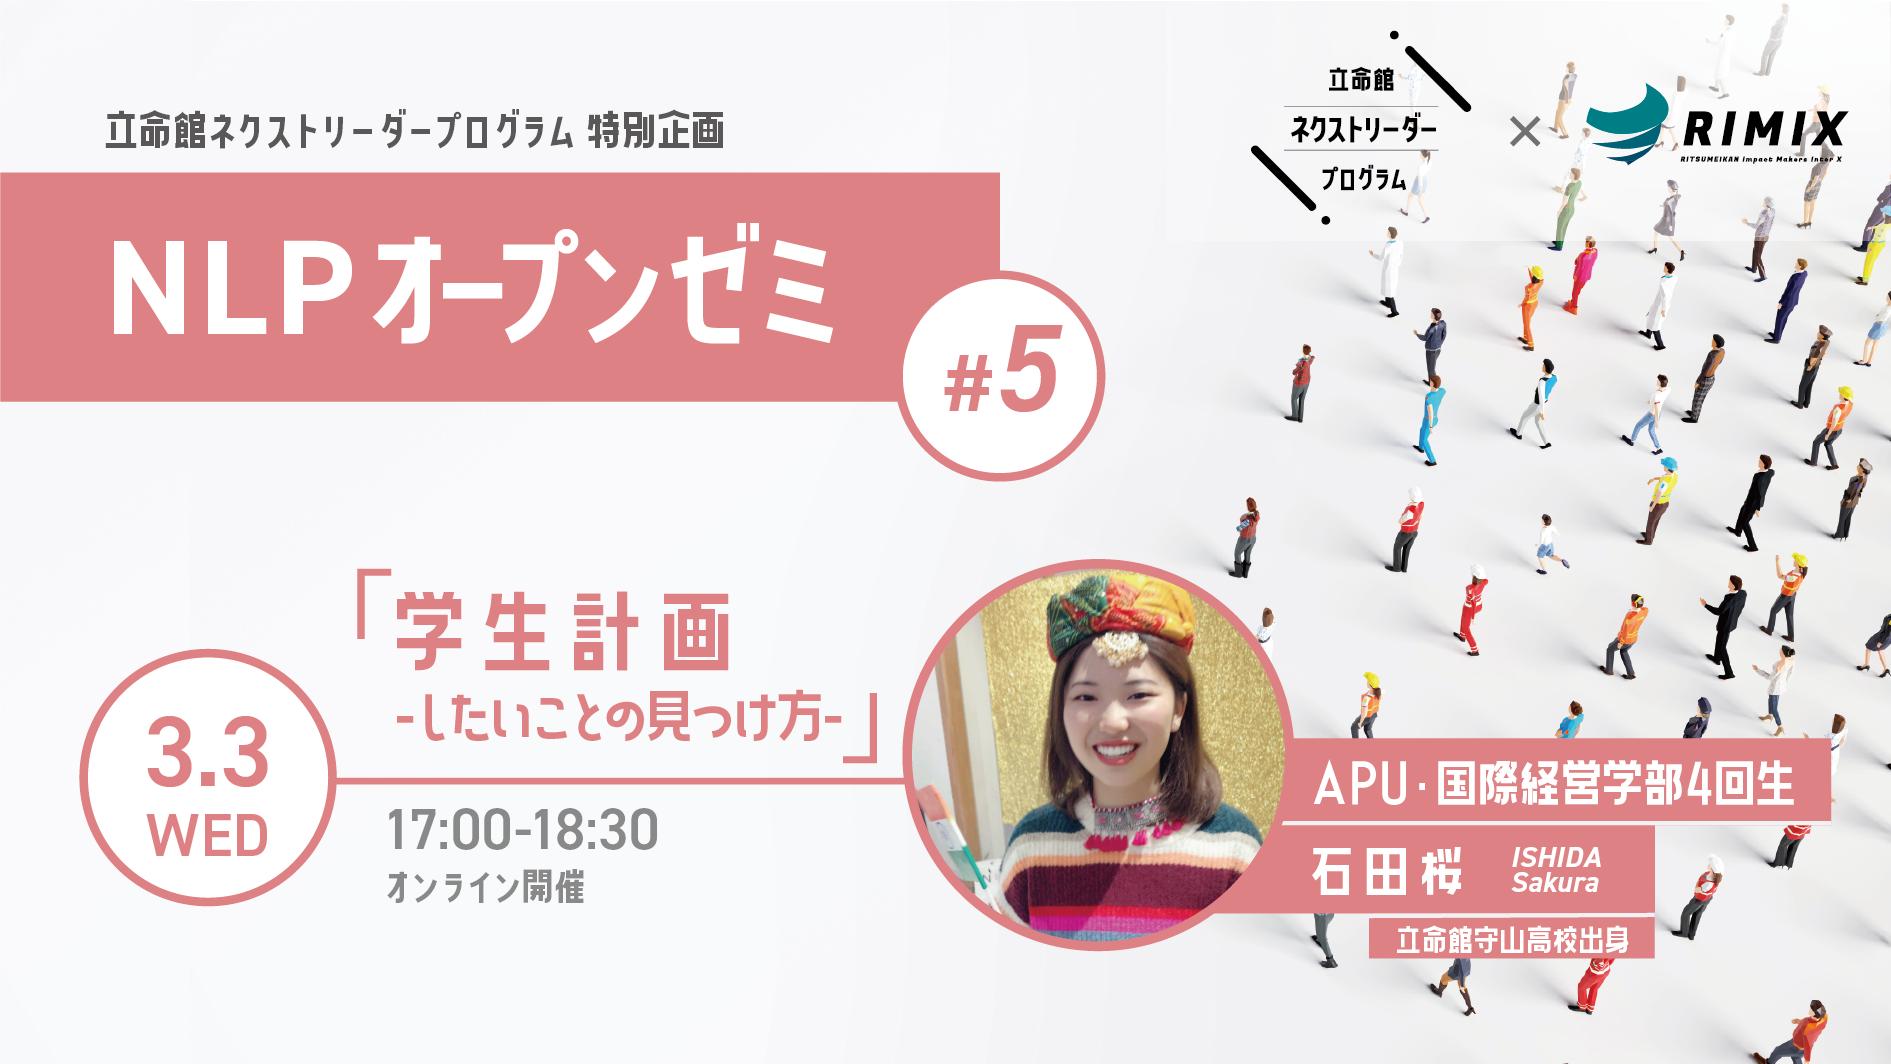 【NLPオープンゼミ#5】石田桜と語る「学生計画-したいことの見つけ方-」